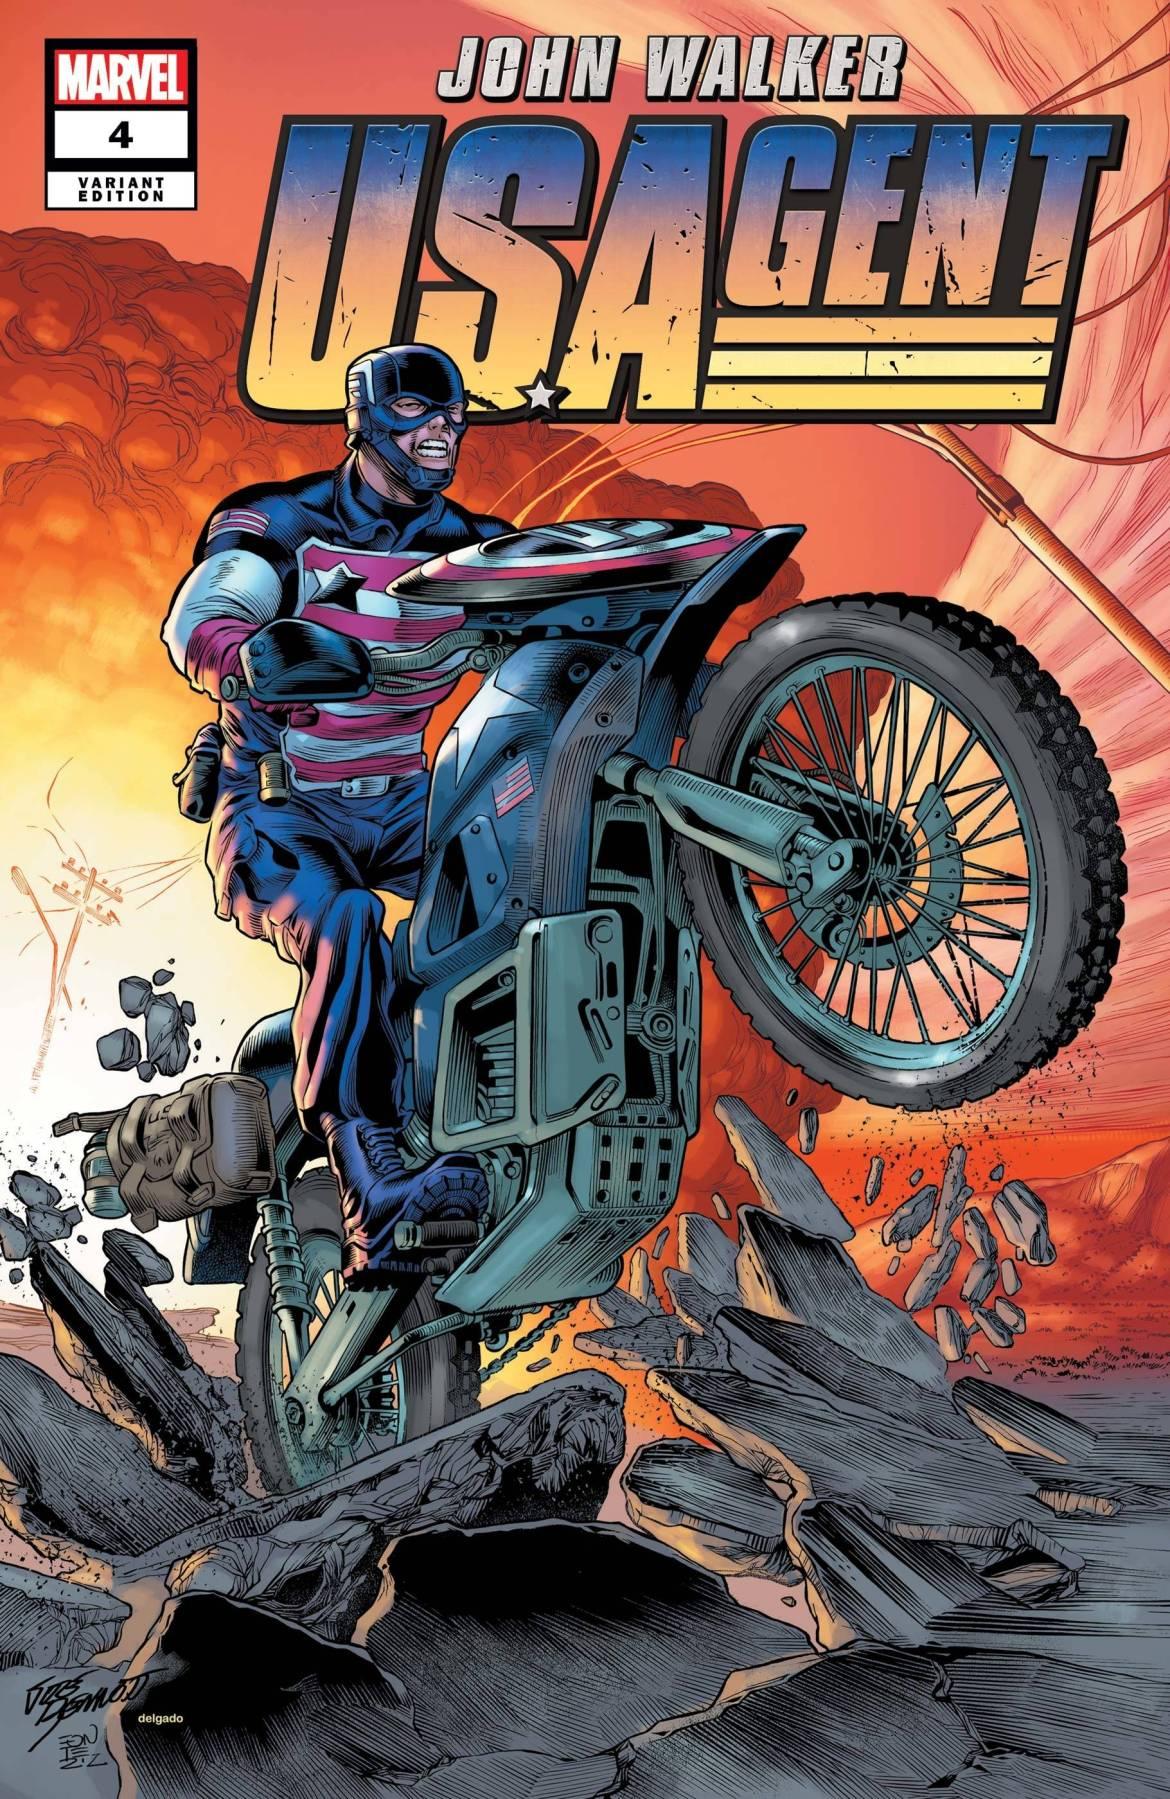 STL177443 ComicList: Marvel Comics New Releases for 03/31/2021